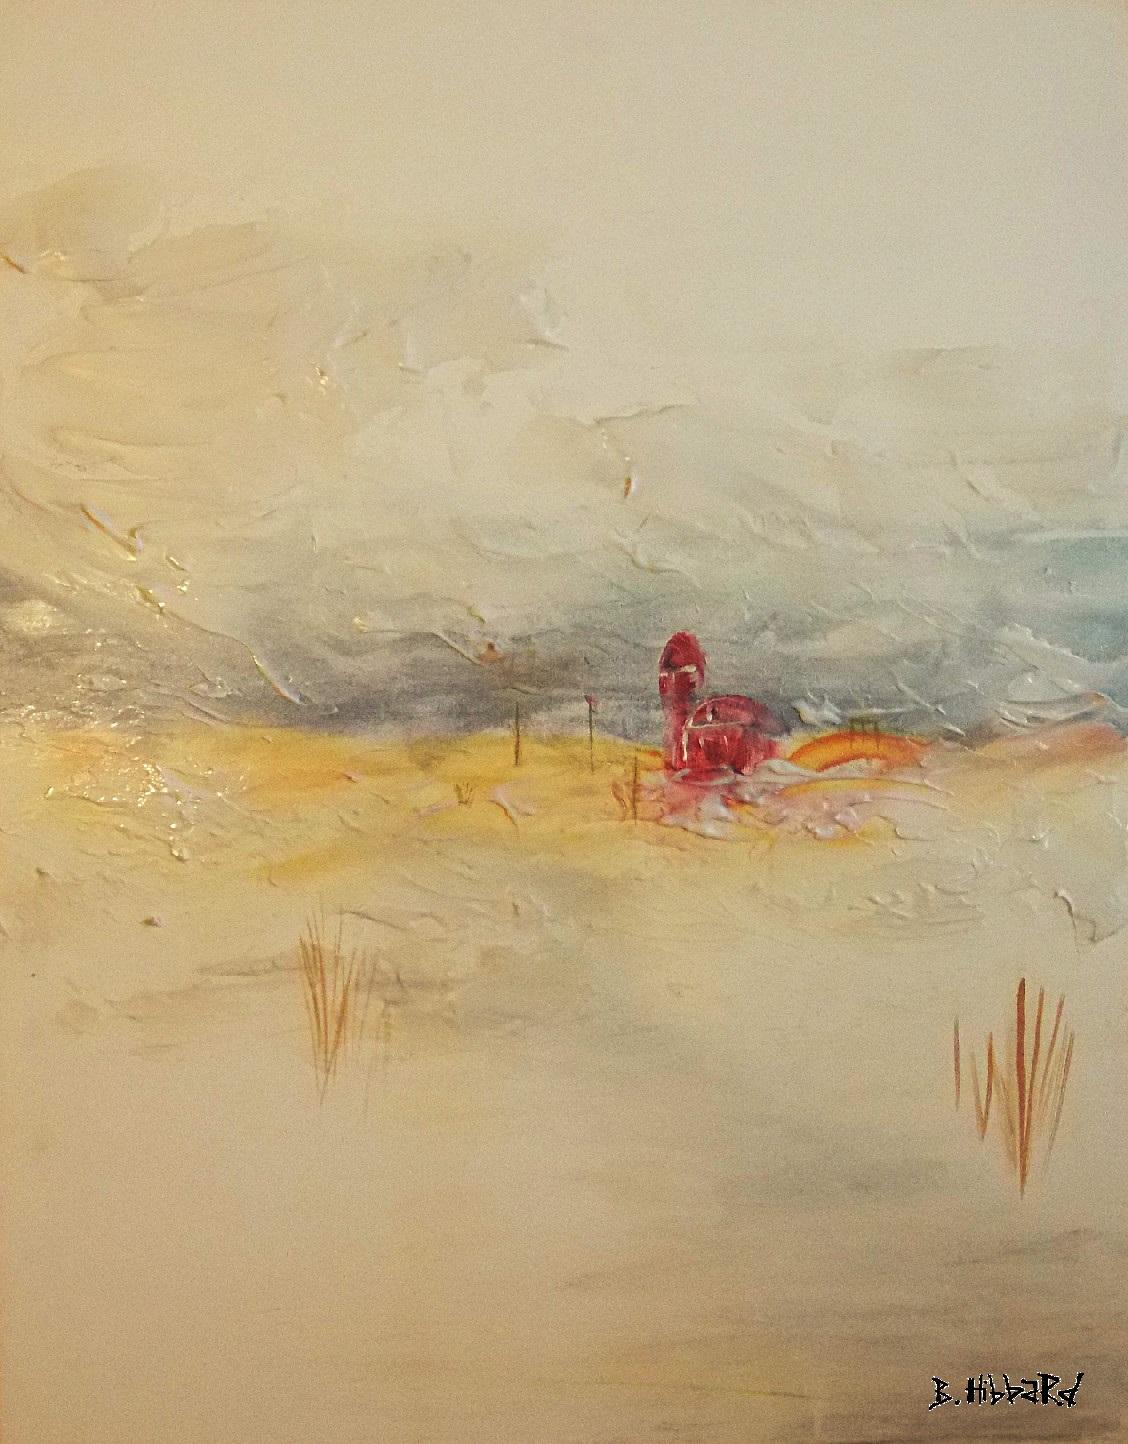 """Wisconsin Winter"" Brian R. Hibbard 2012"